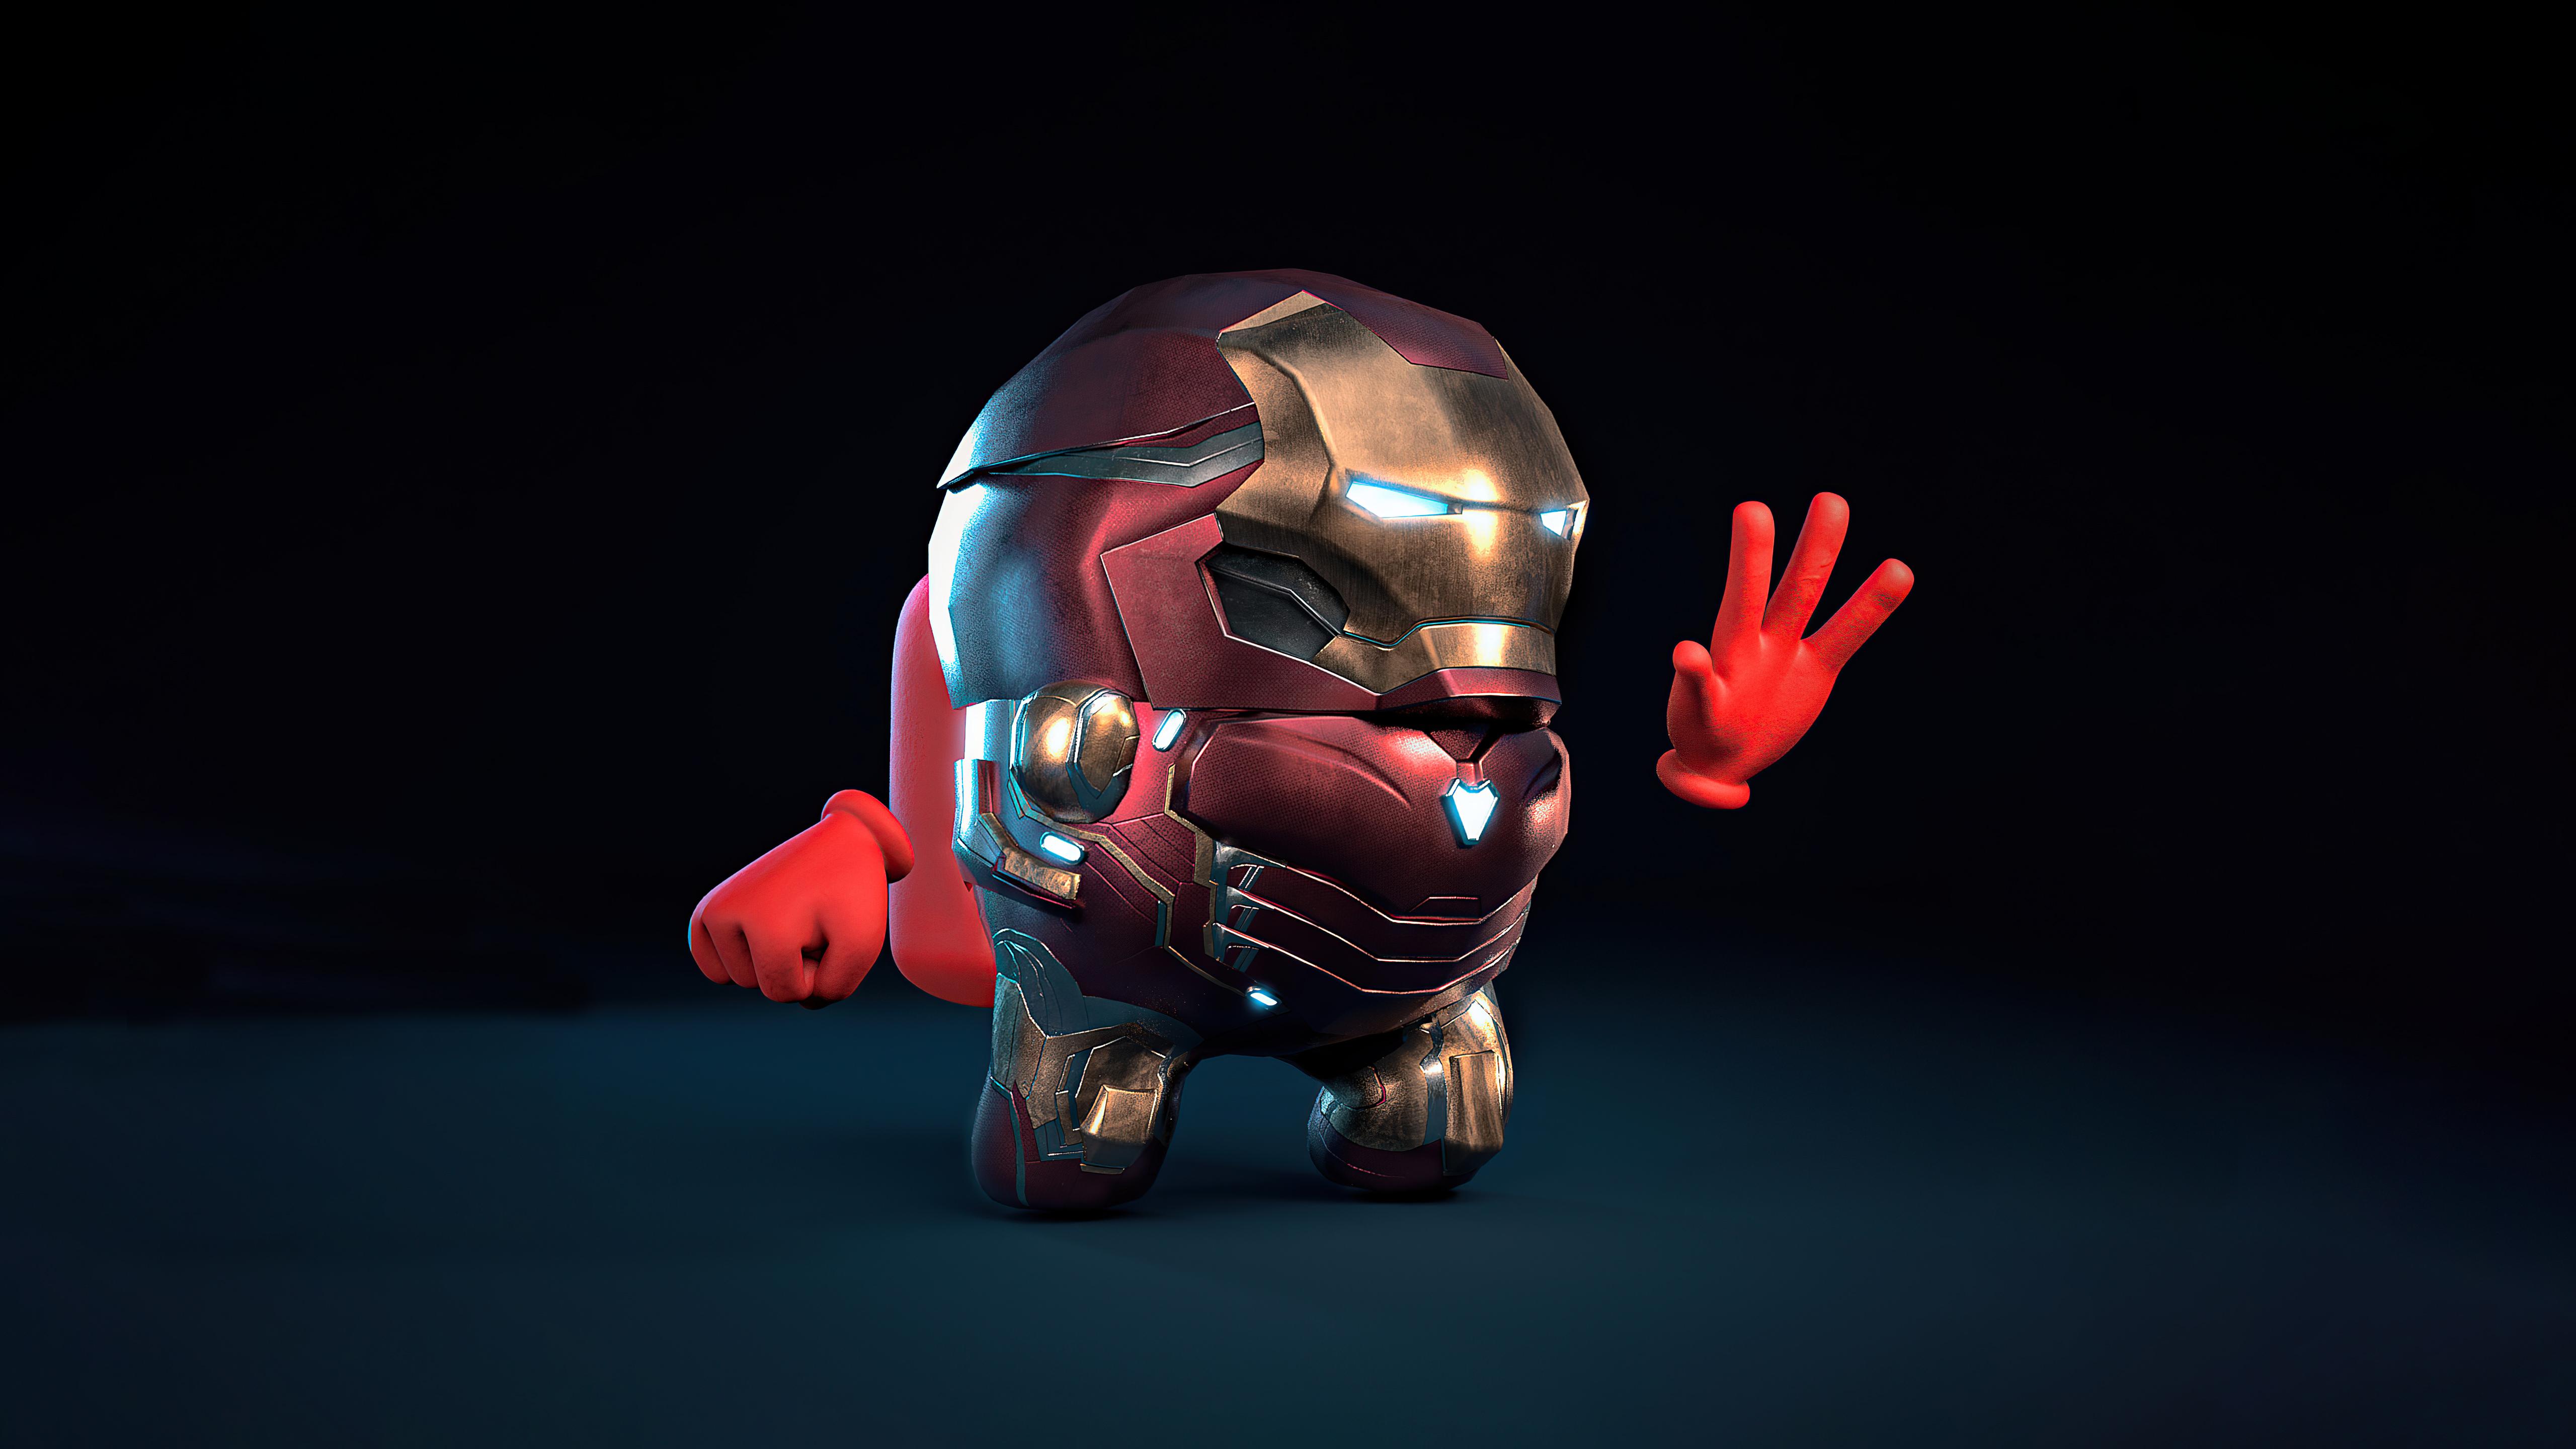 iron man among us 4k 1618136794 - Iron Man Among Us 4k - Iron Man Among Us 4k wallpapers